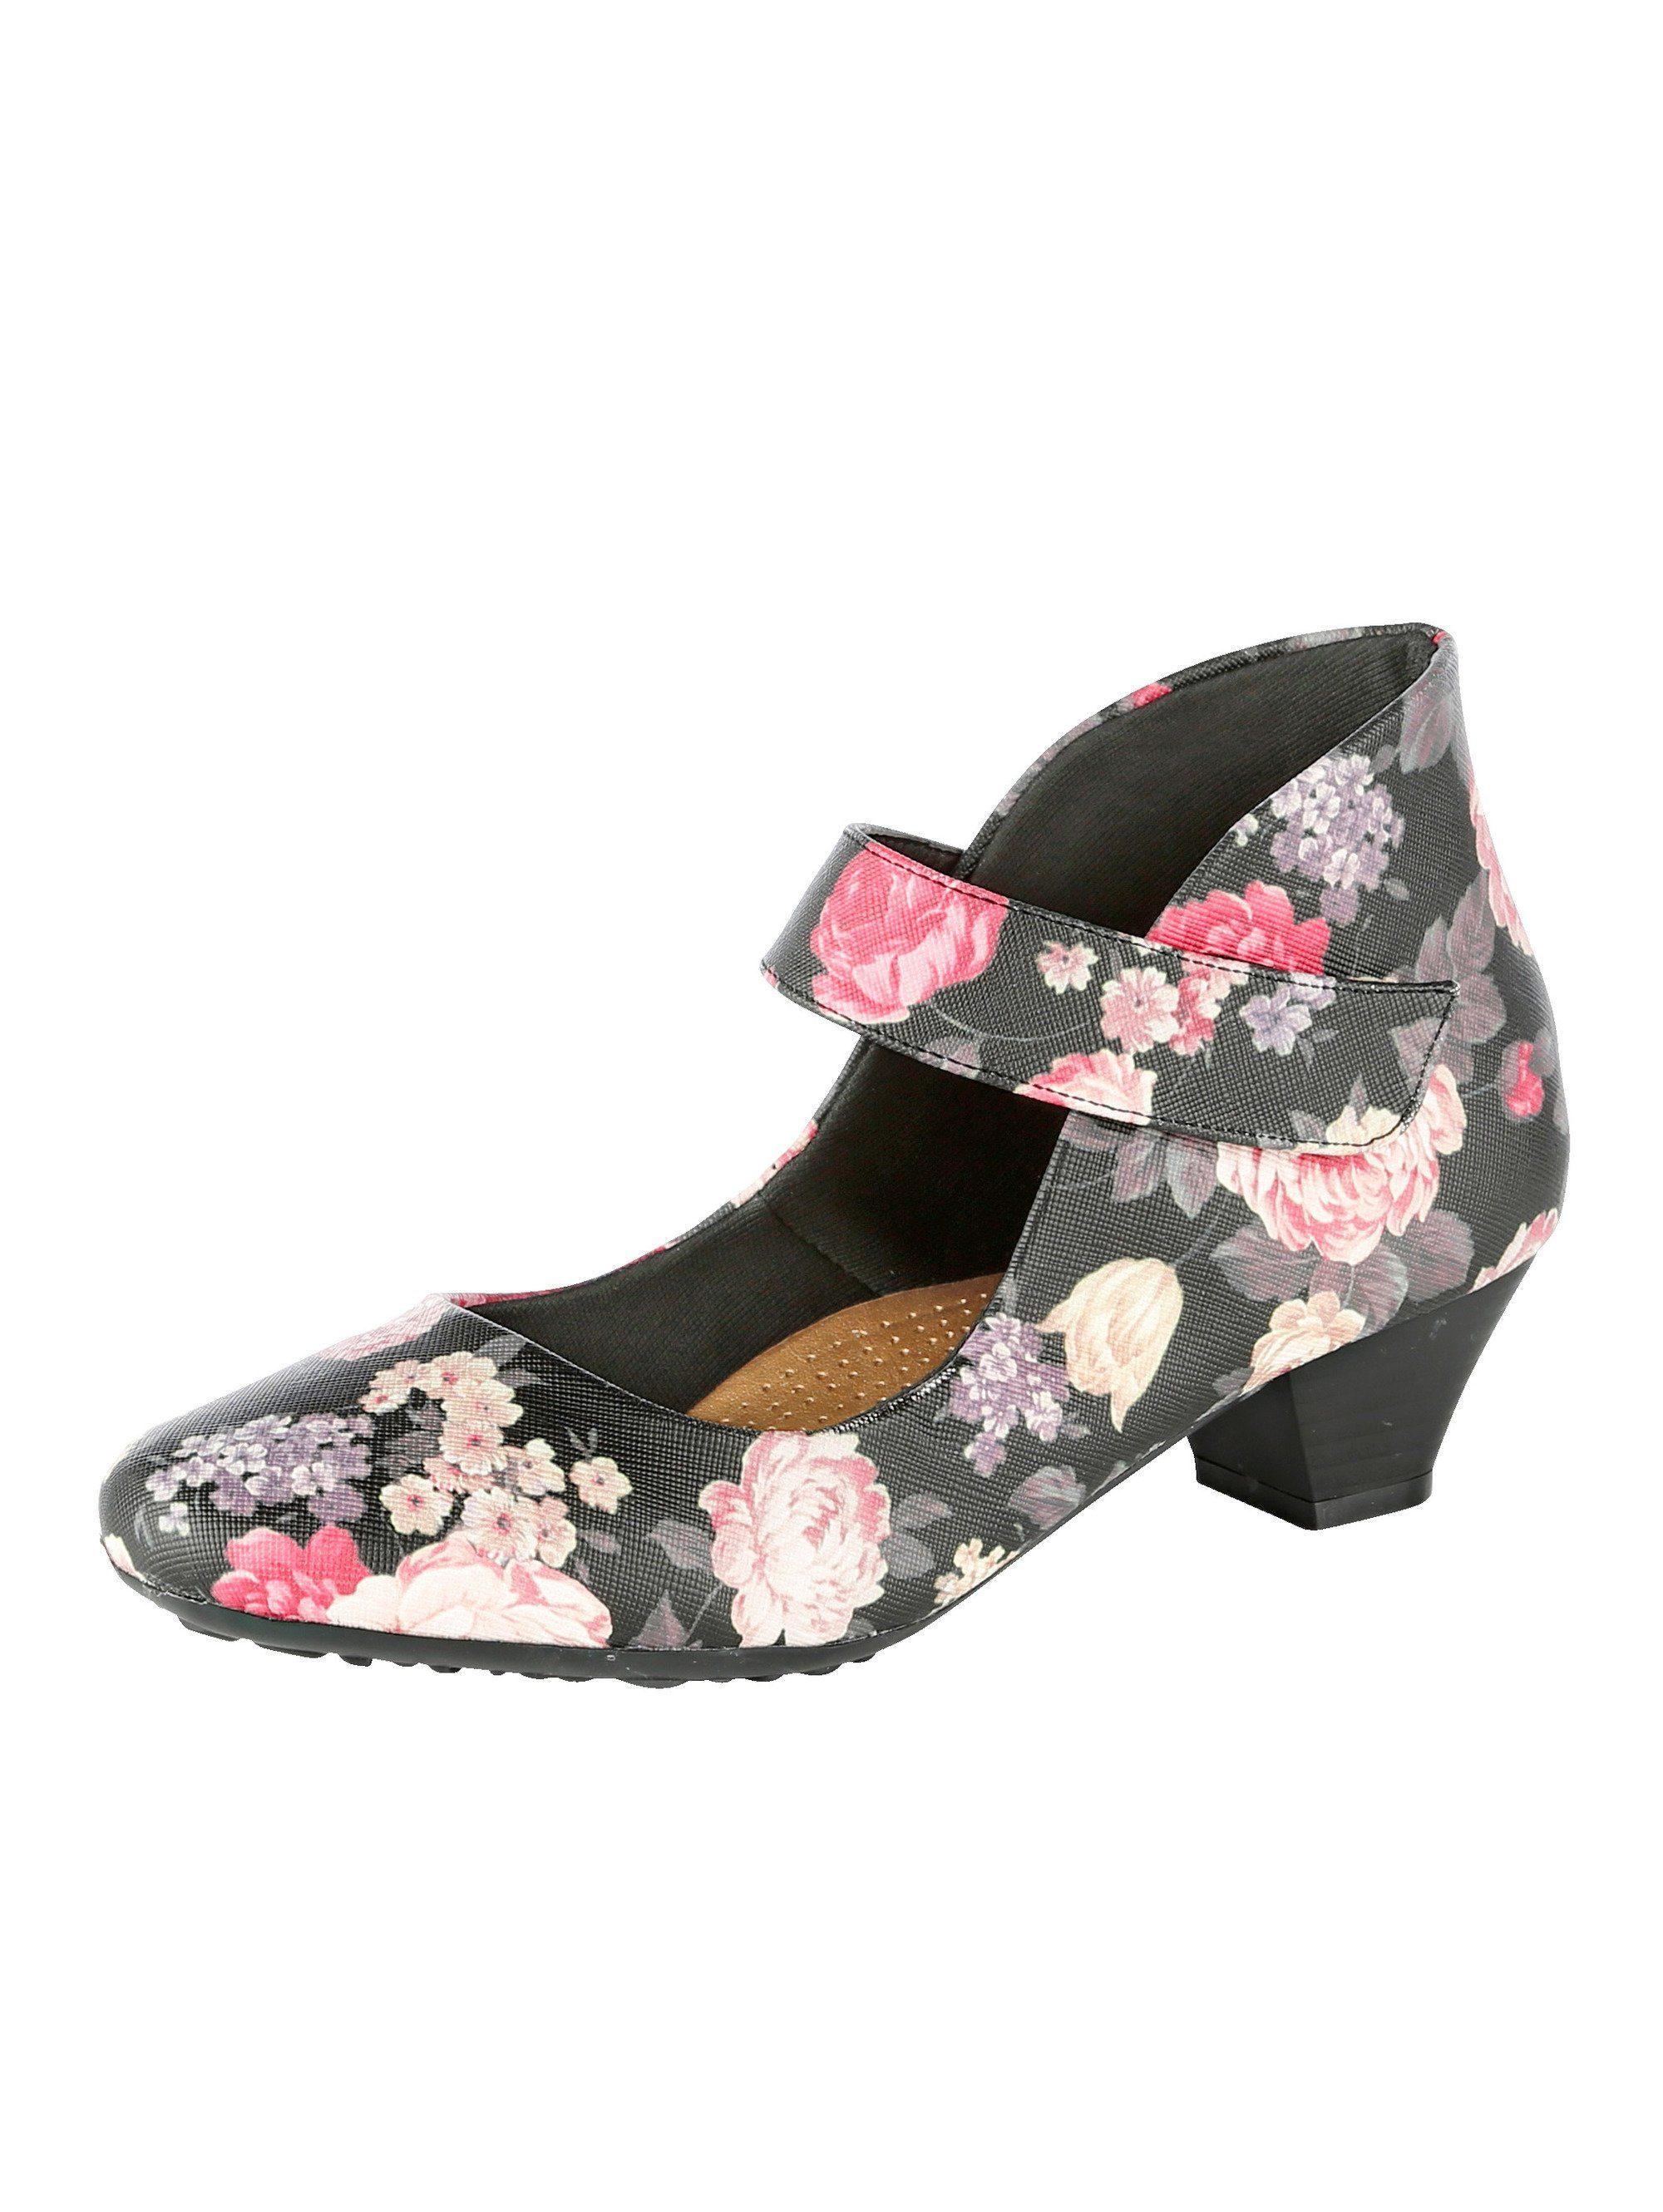 Mae&Mathilda Spangenpumps in elegantem Look kaufen  schwarz#ft5_slash#floral